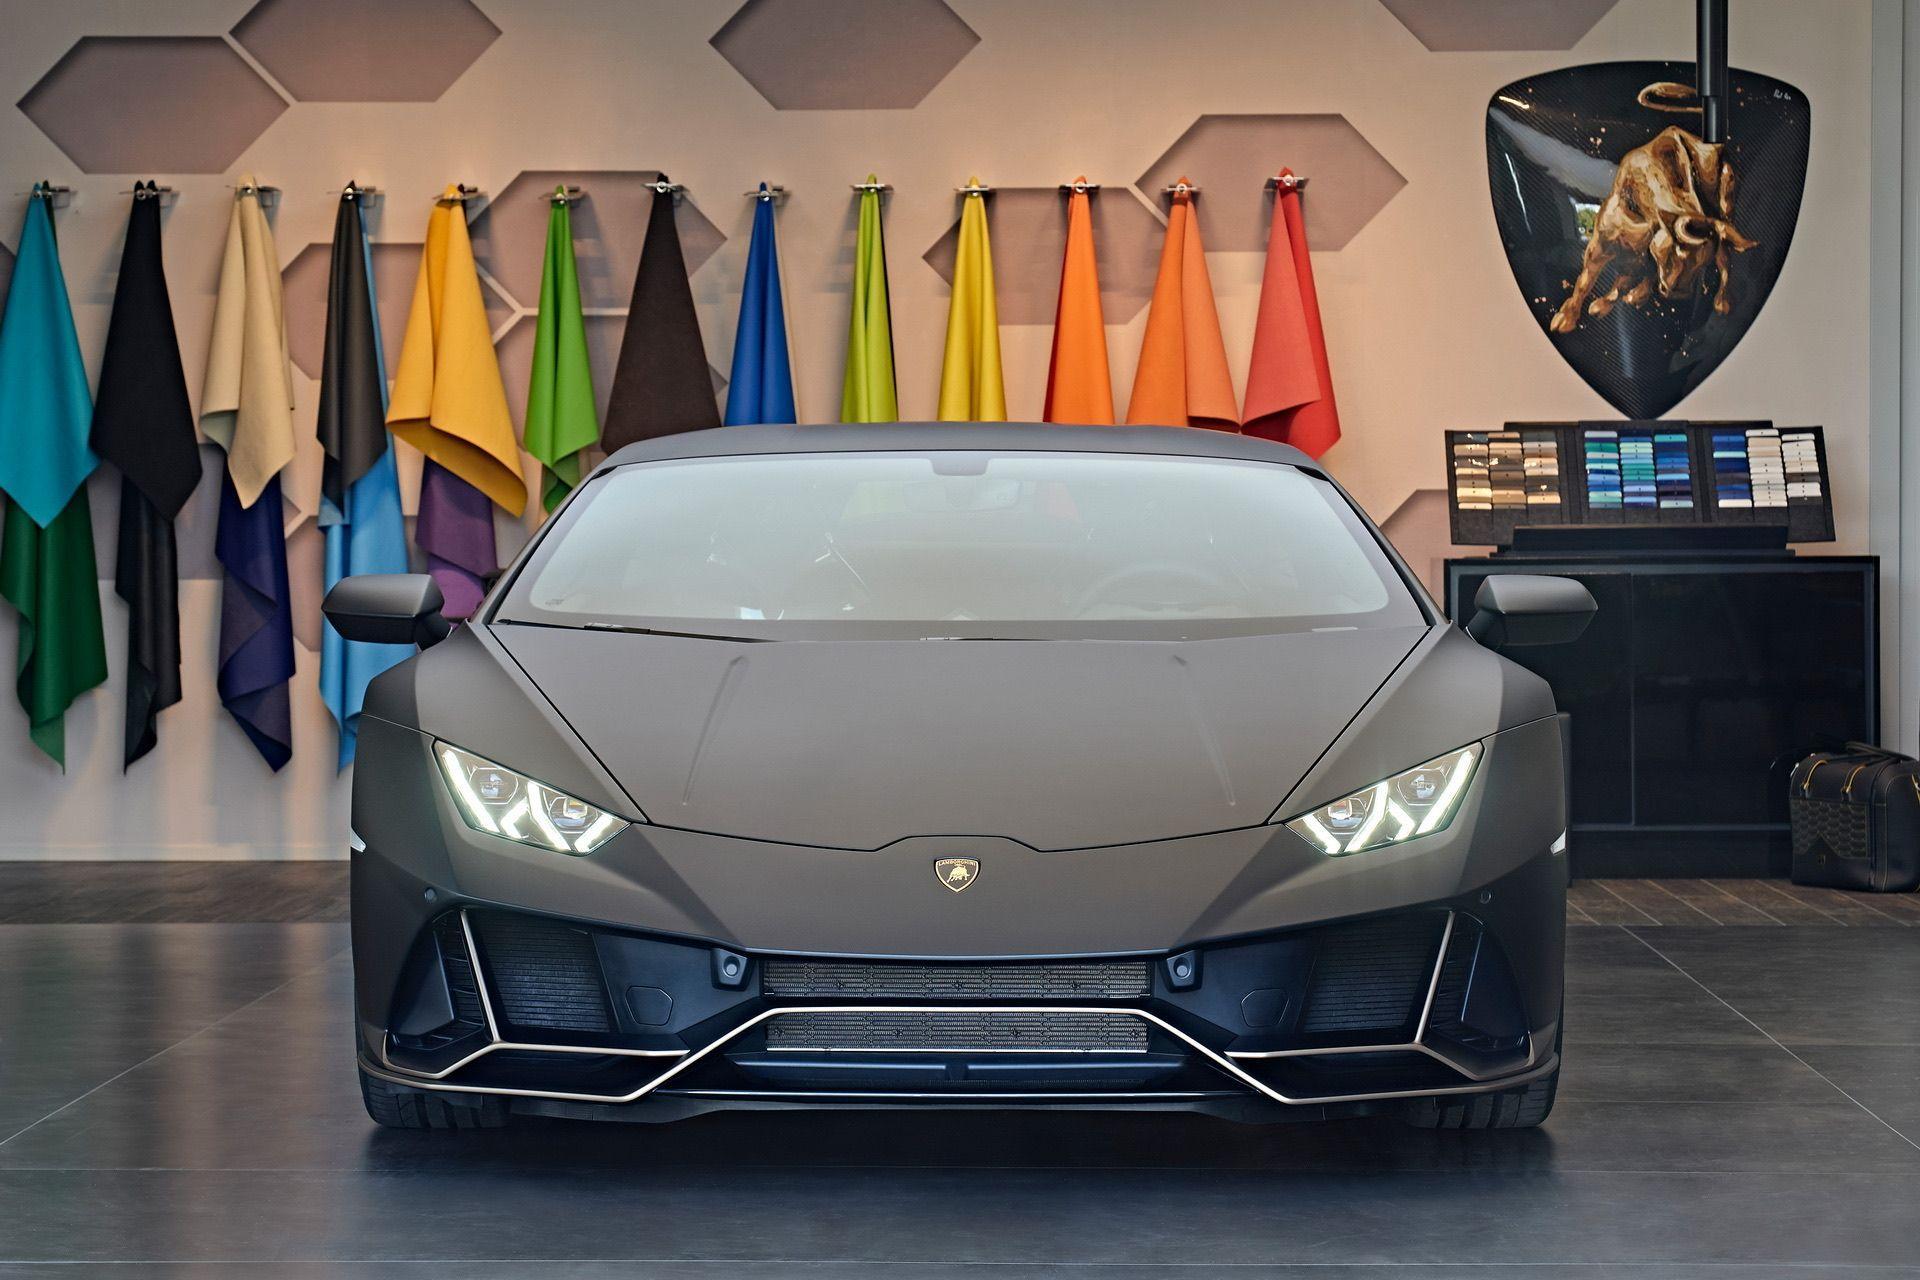 Lamborghini-Huracan-for-Mexico15_1920x1280